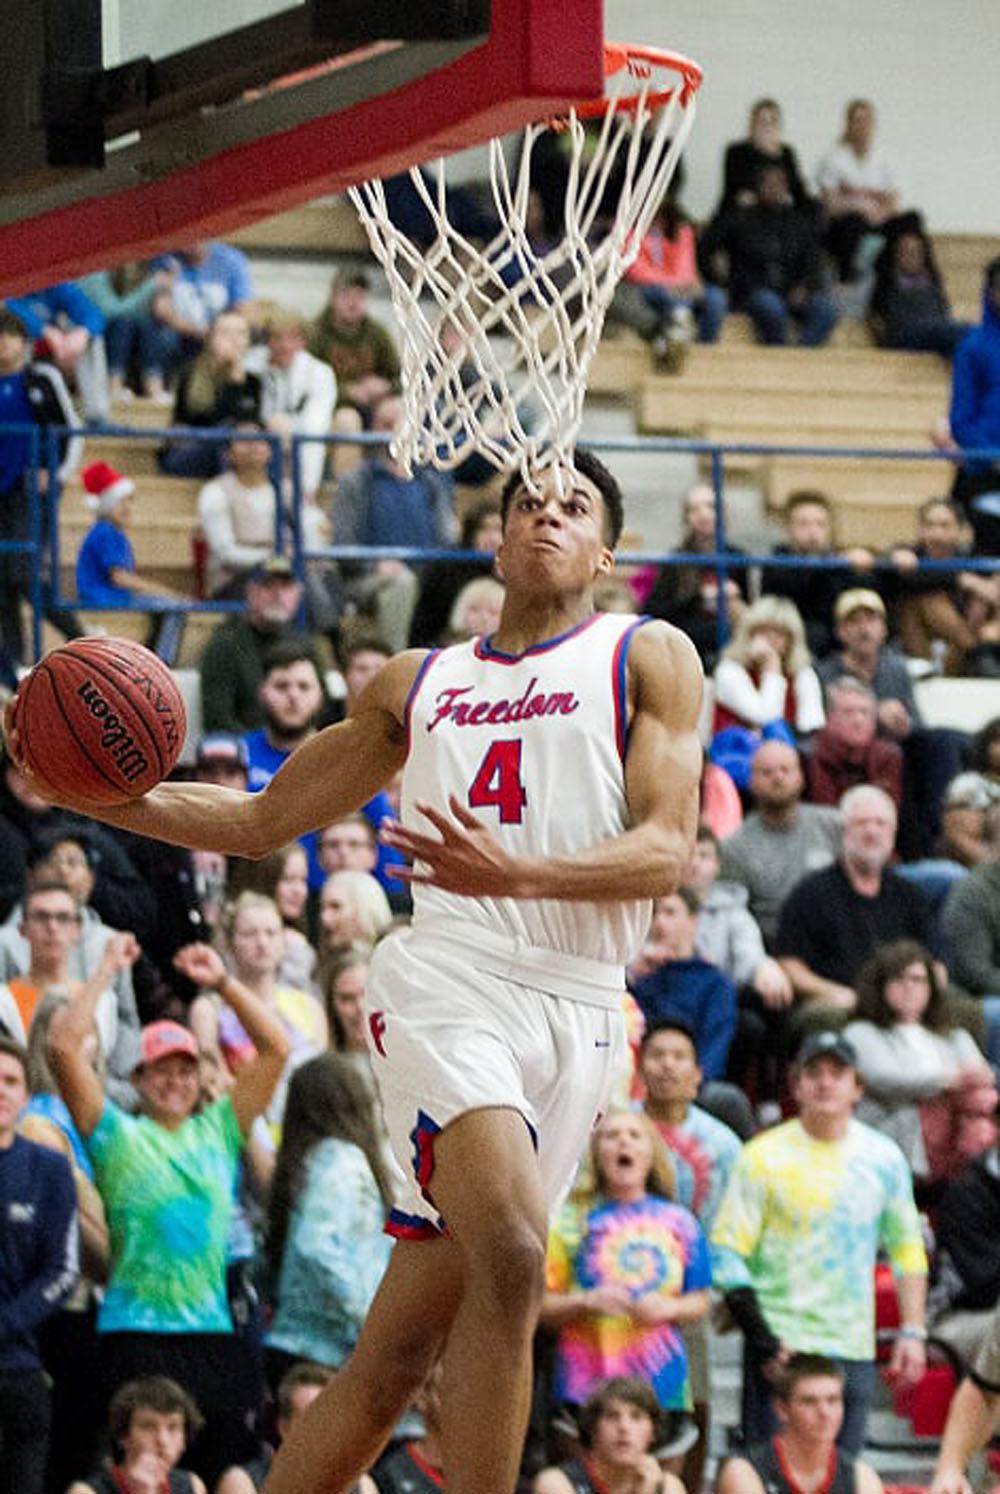 spl1206 Freedom-Patton basketball 1.jpg